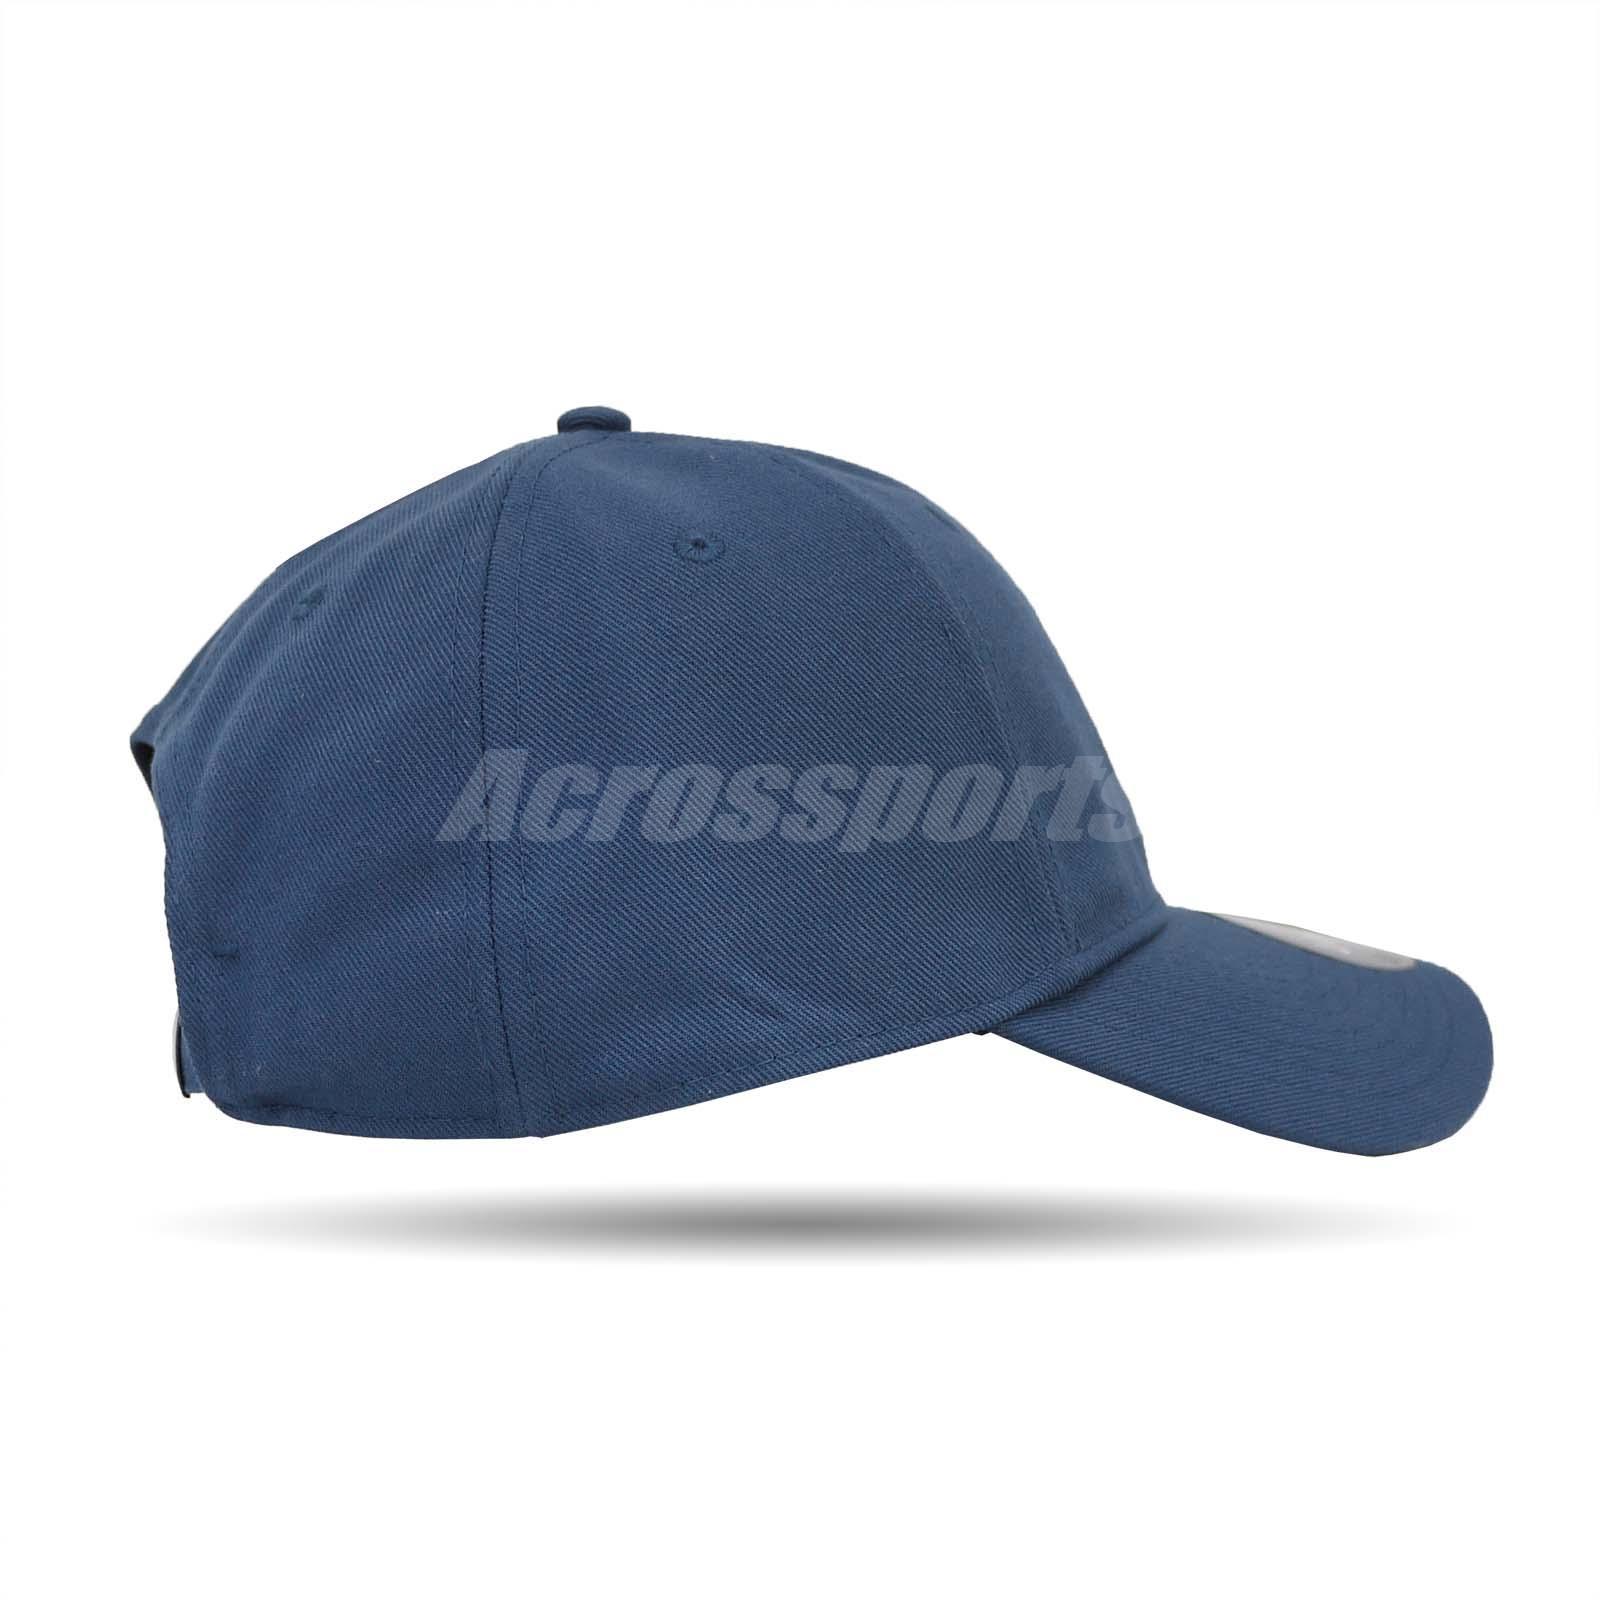 5741e95271dc Nike Jordan Jumpman Floppy H86 Adjustable Hat Heritage Gym Cap Blue ...